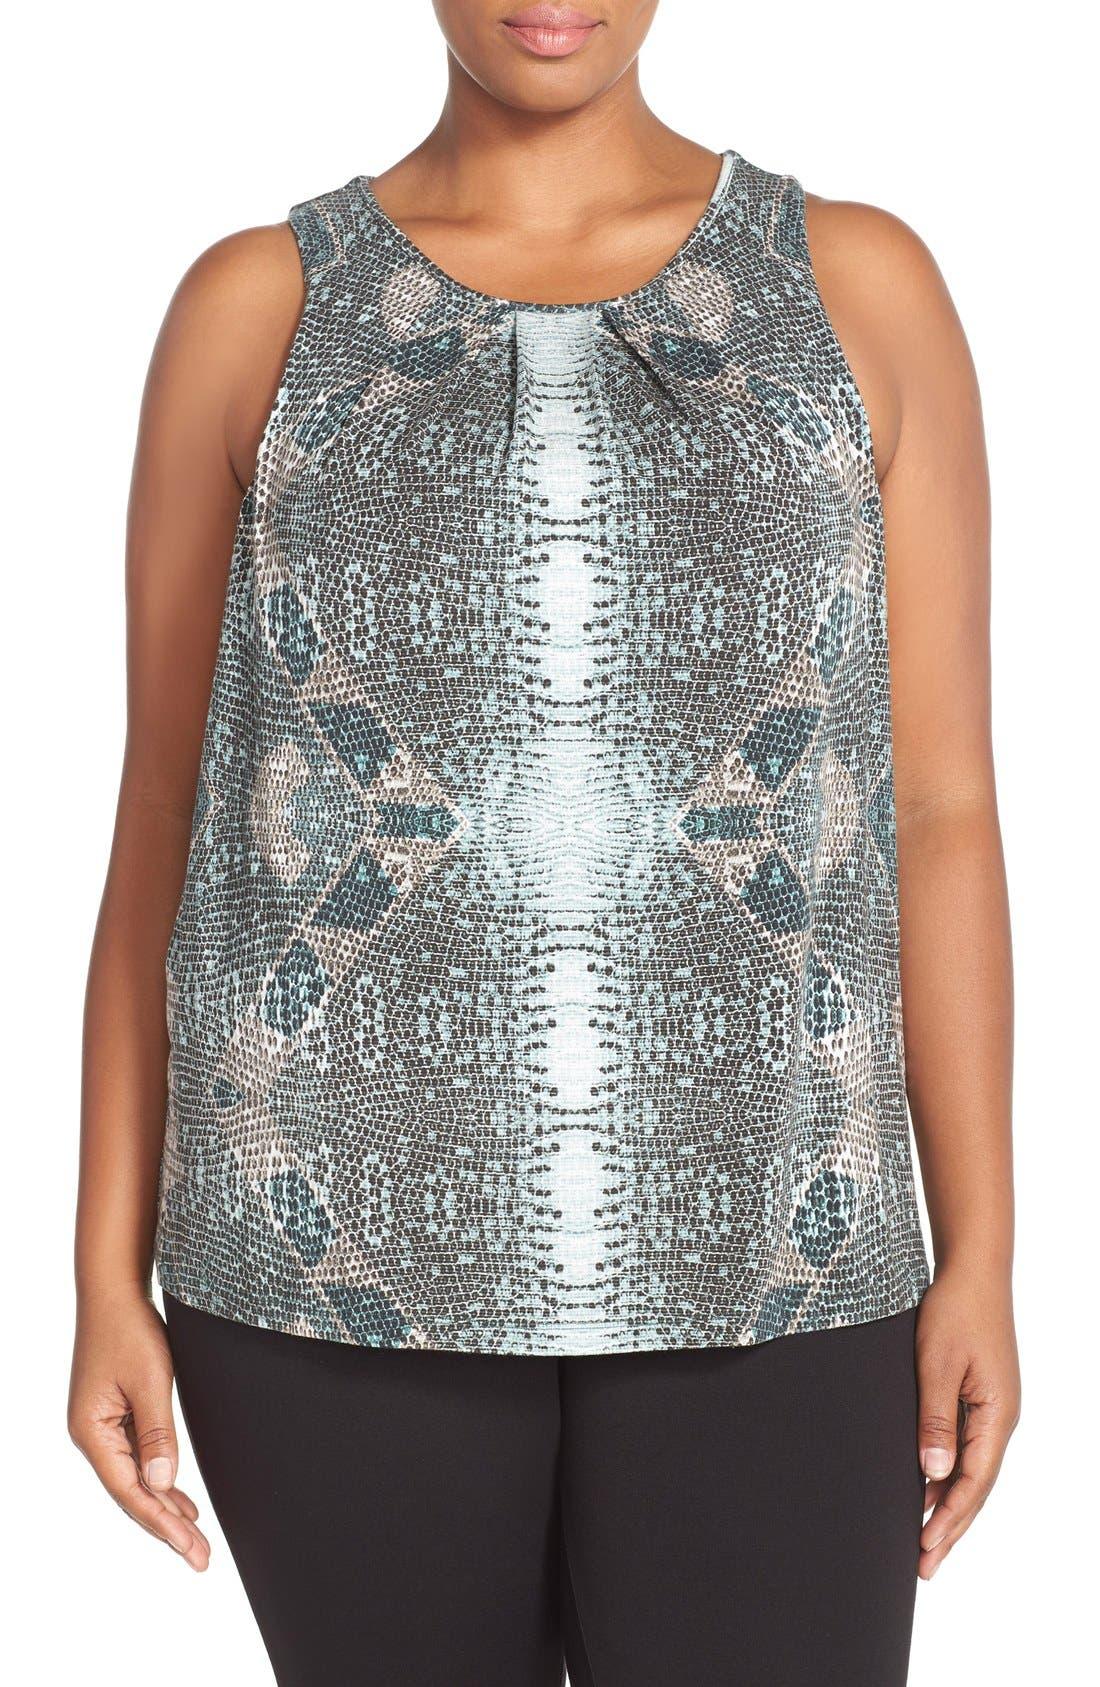 Alternate Image 1 Selected - Tart 'Jewell' Pleat Neck Print Top (Plus Size)